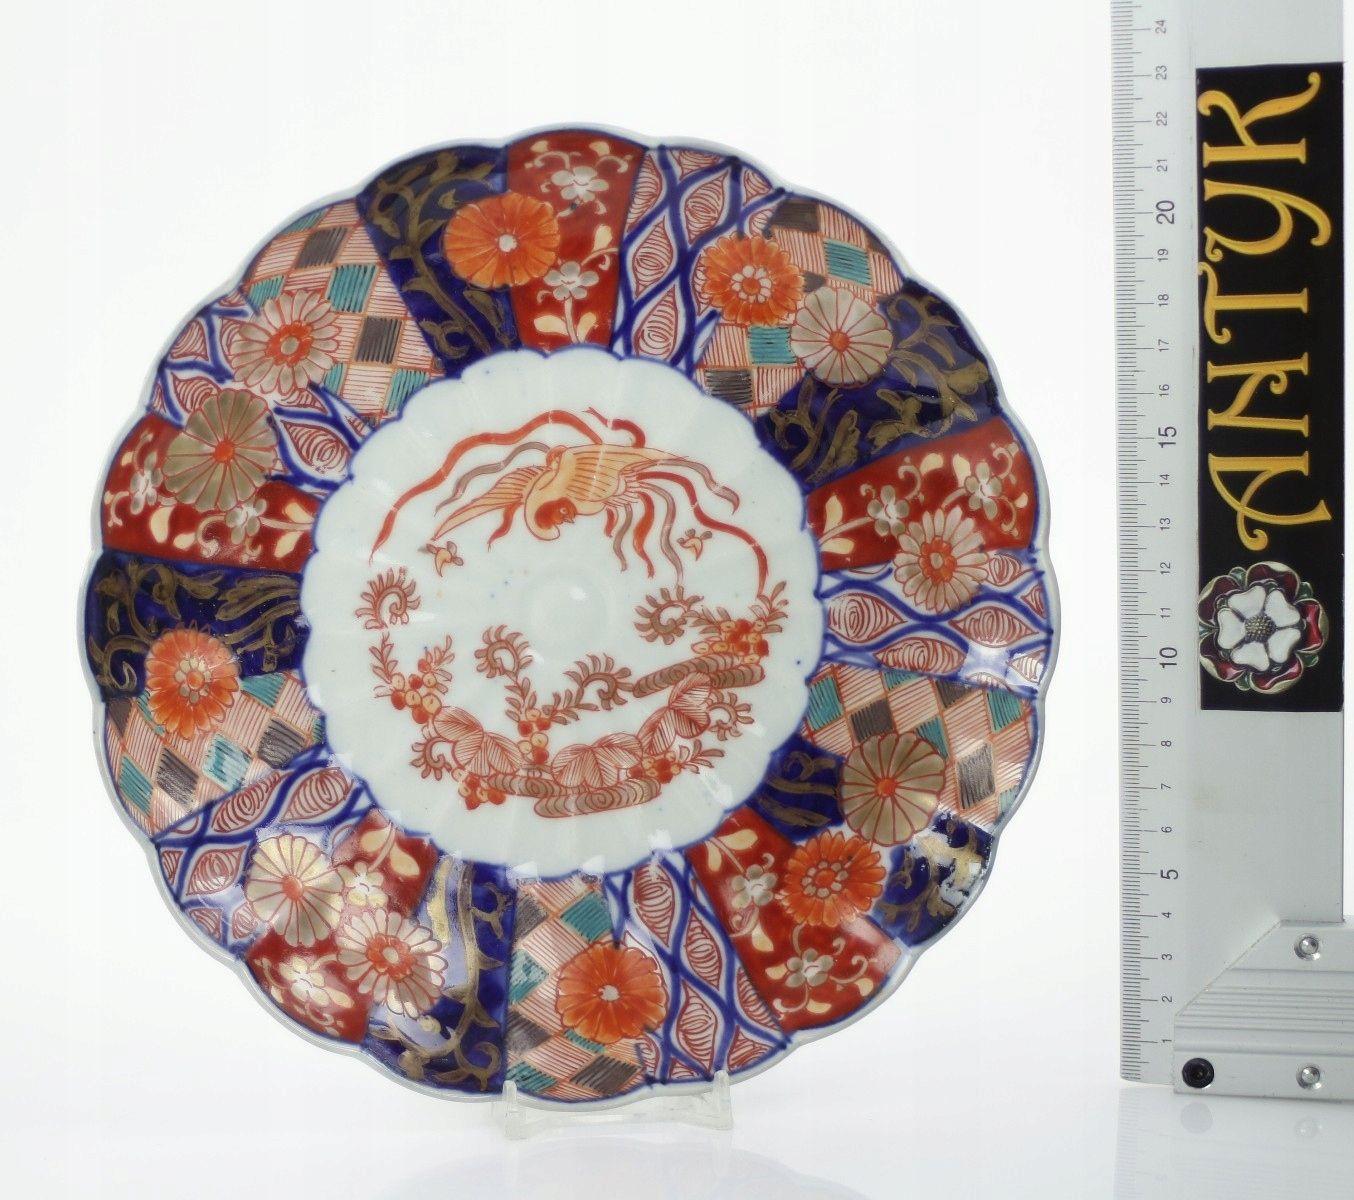 Antyk Talerz Imari Xix W 7518861343 Oficjalne Archiwum Allegro Imari Plates Tableware